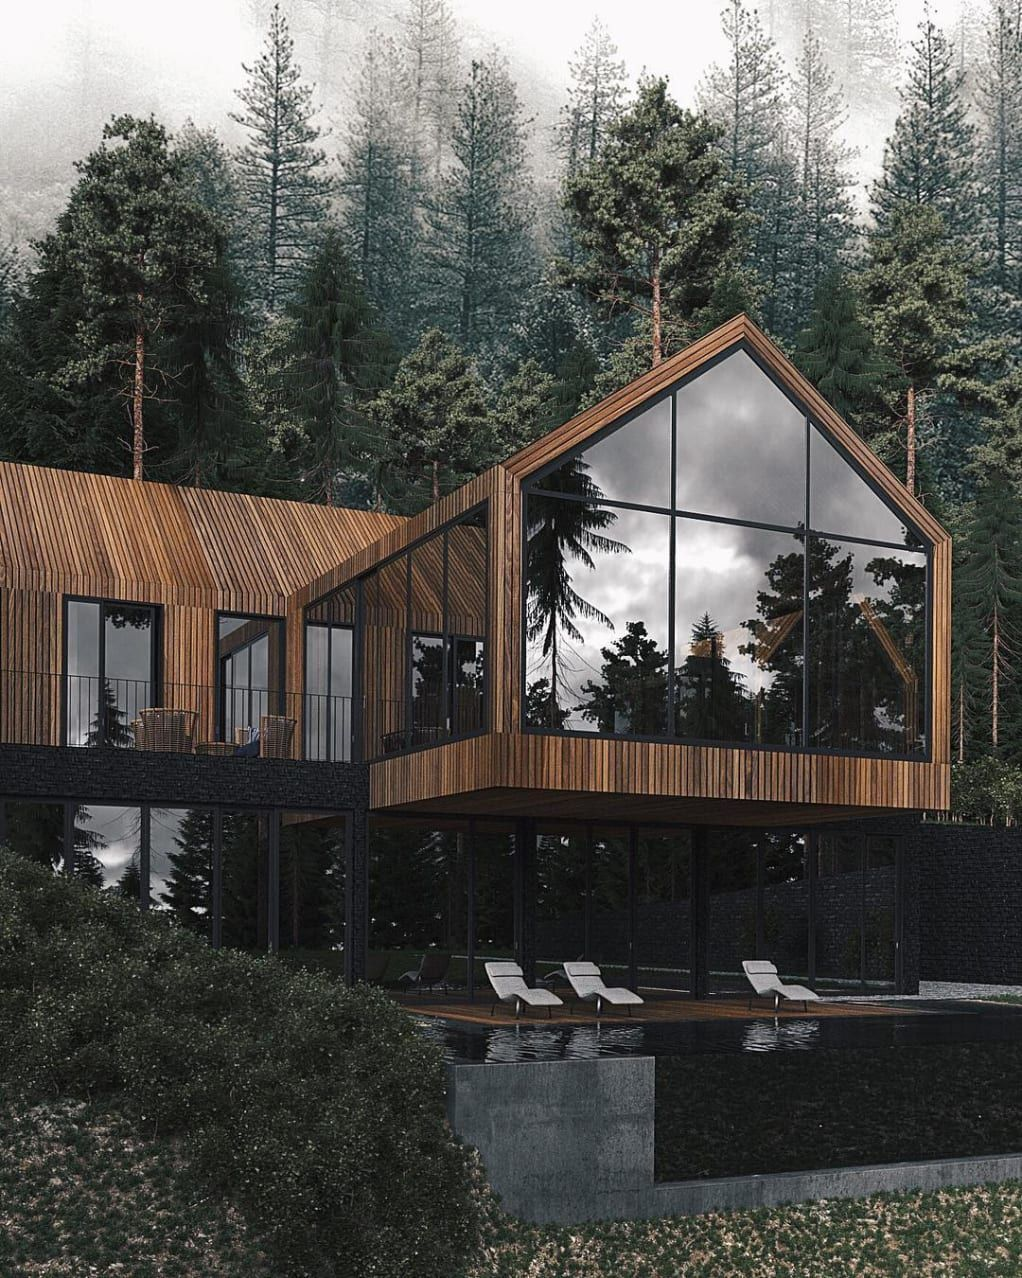 Random Inspiration 399 In 2020 Contemporary House Design Forest House House Exterior